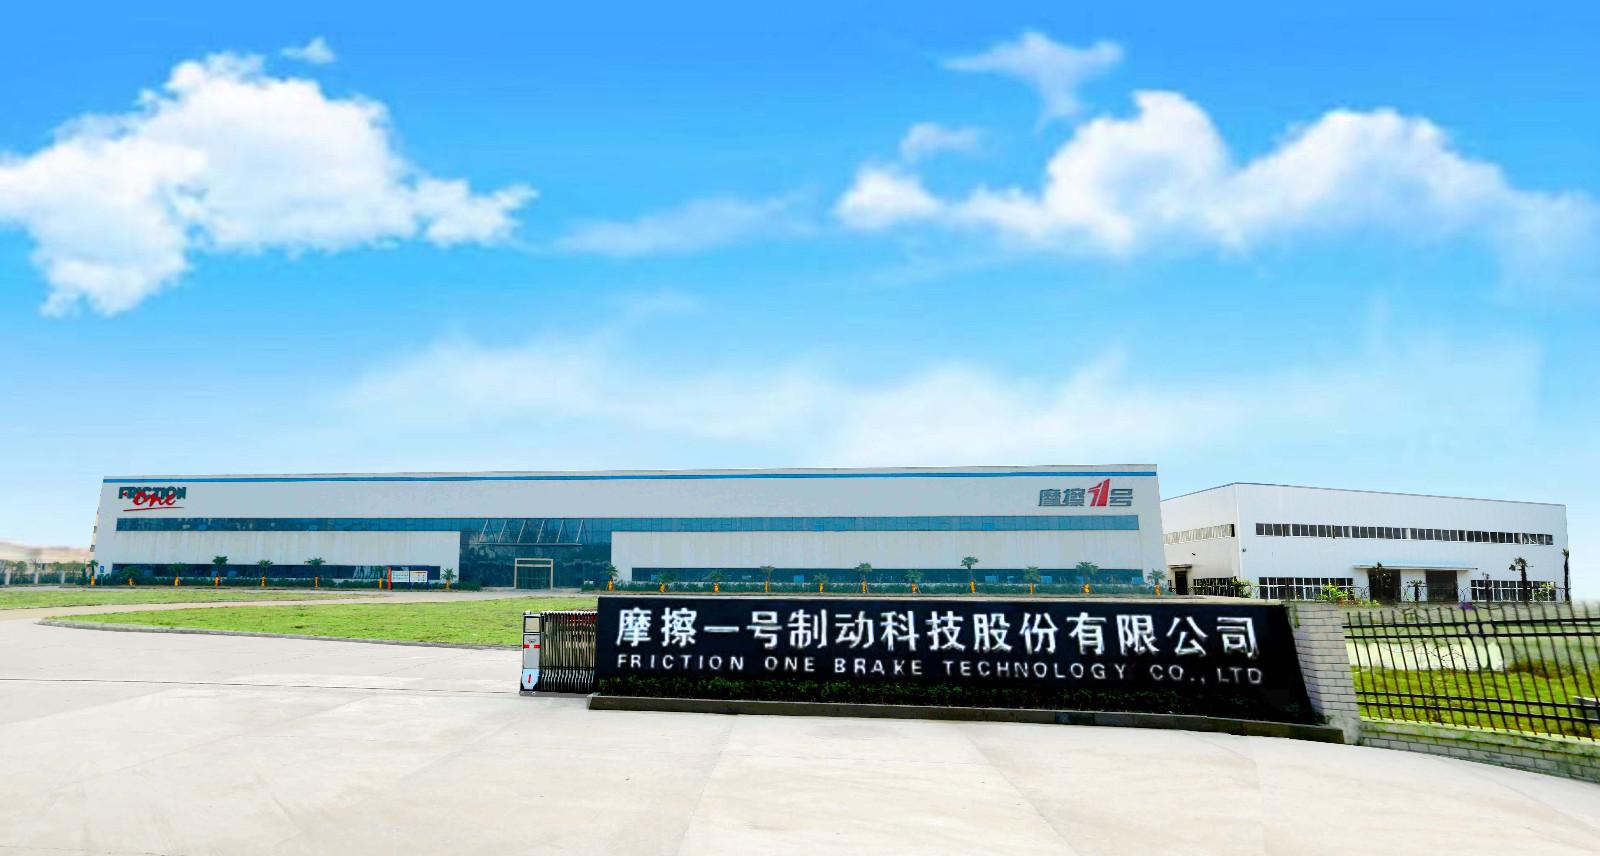 Friction One Brake Technology (Xiantao) Co., Ltd.